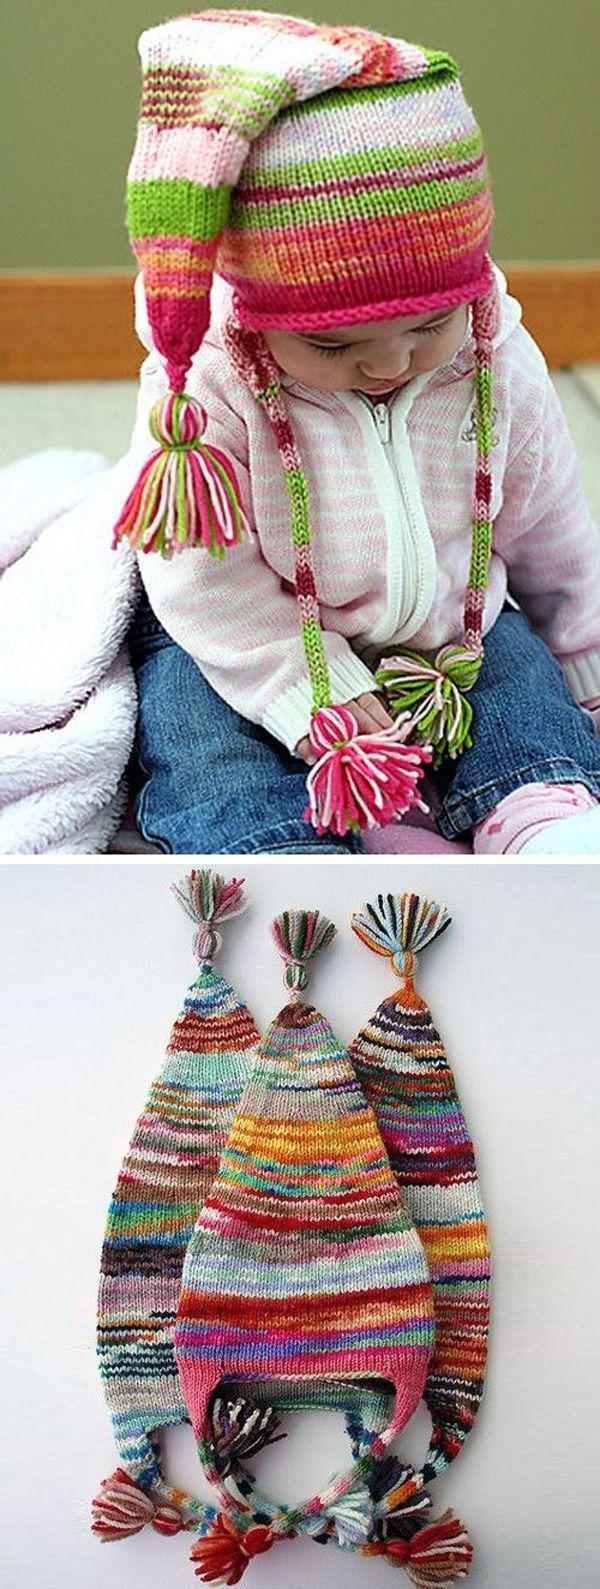 #Easy #Hat #Hudson #Knitting #Pattern Le chapeau Hudson! – Patron de tricot – Tricot …   – crocheted